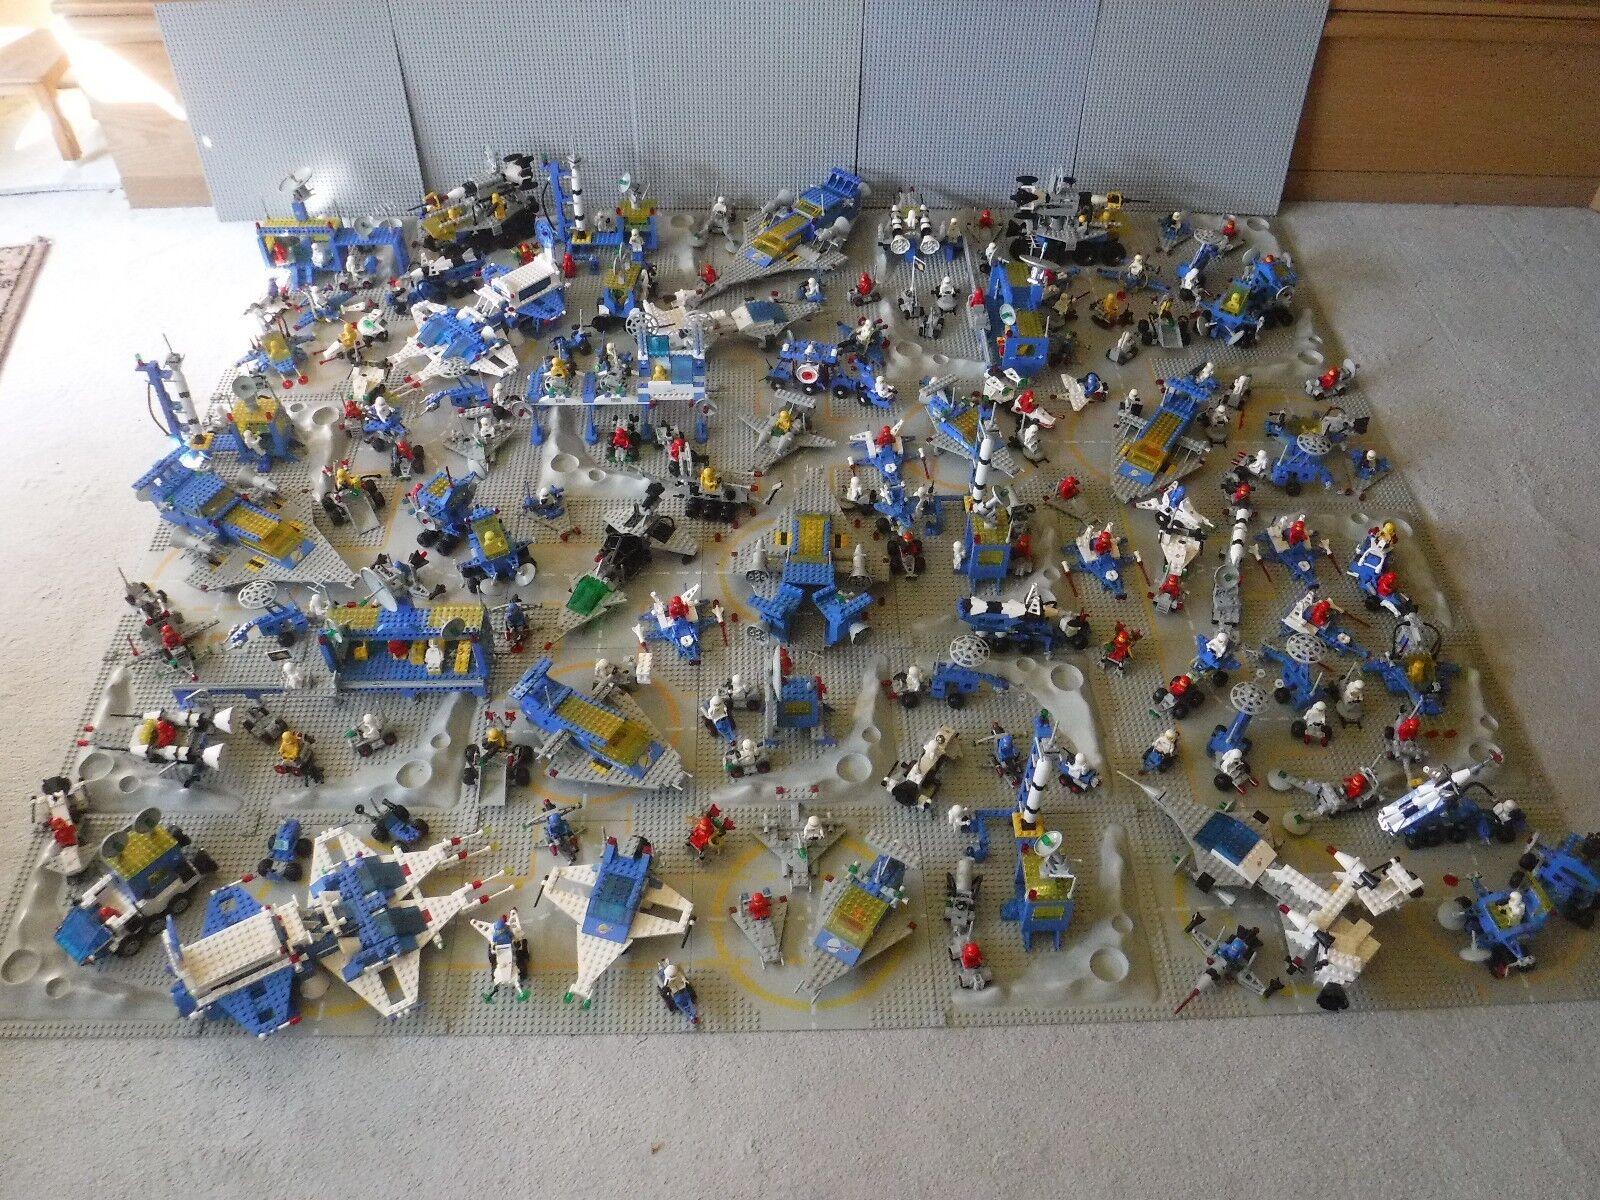 LEGO Space Classic spaziale spaziale raccolta 928/924/918, ecc. LEGGETE